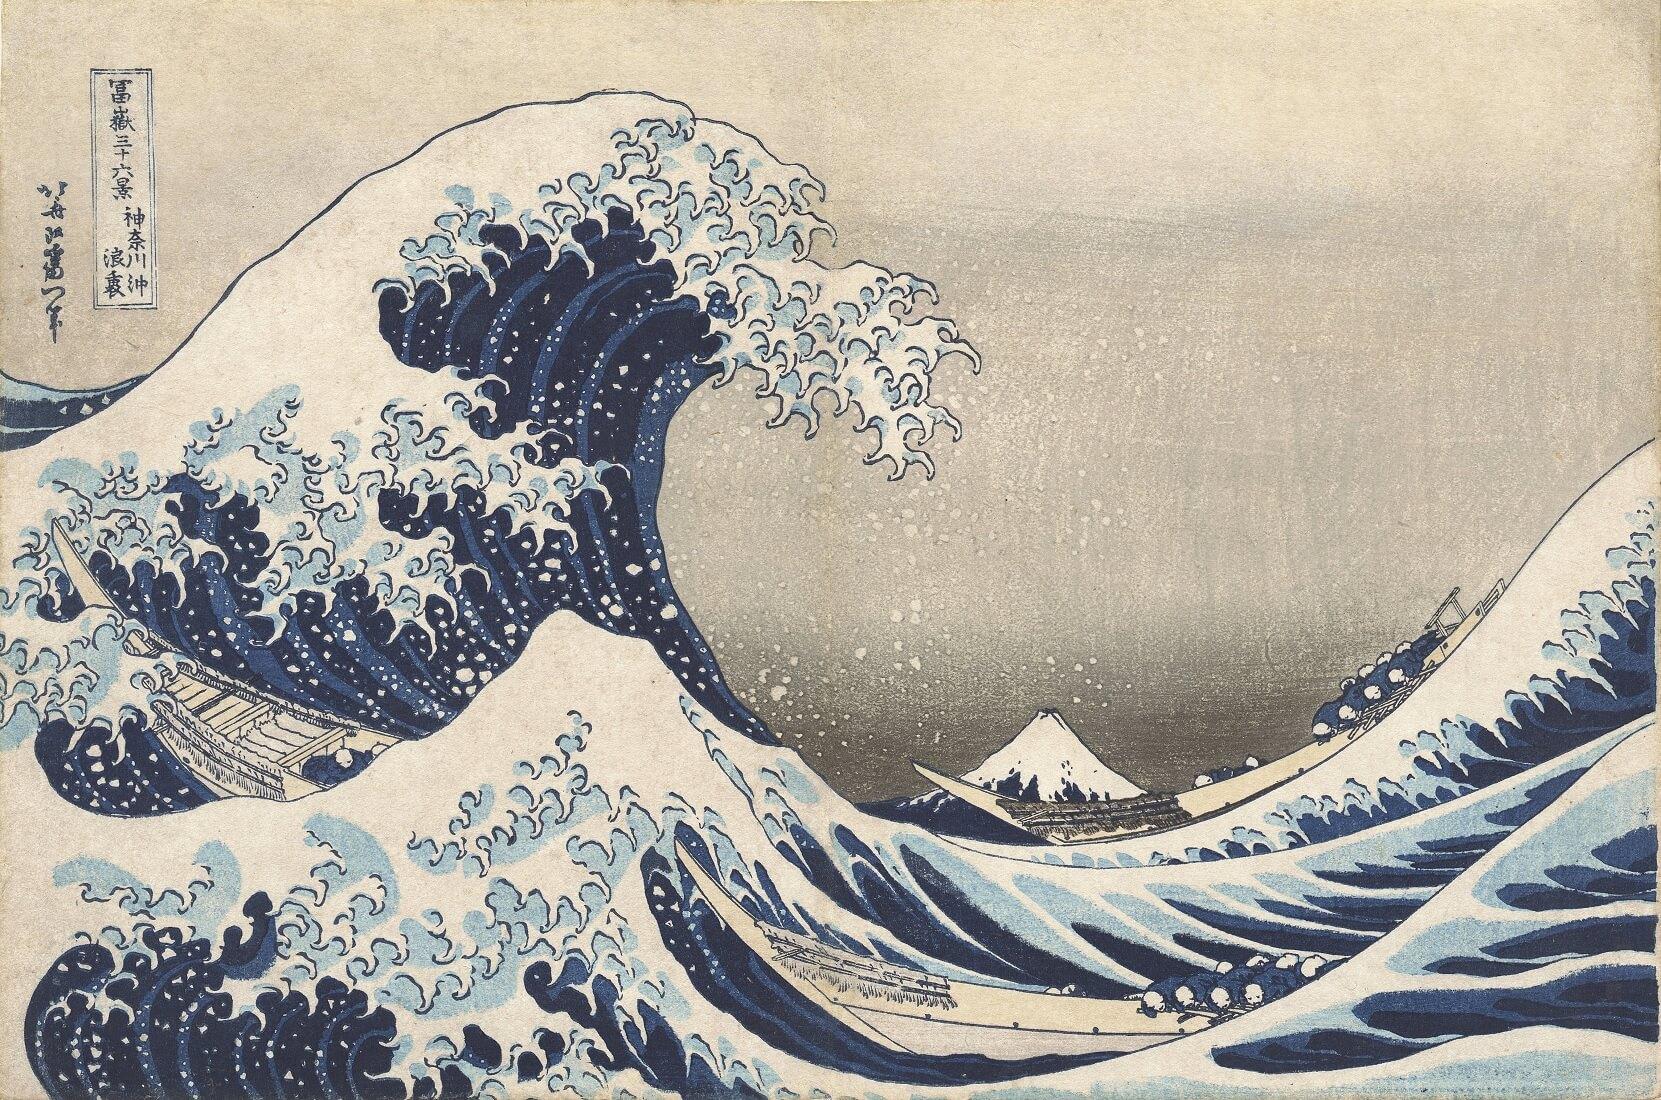 La grande onda di Kanagawa, opera del giapponese Hokusai